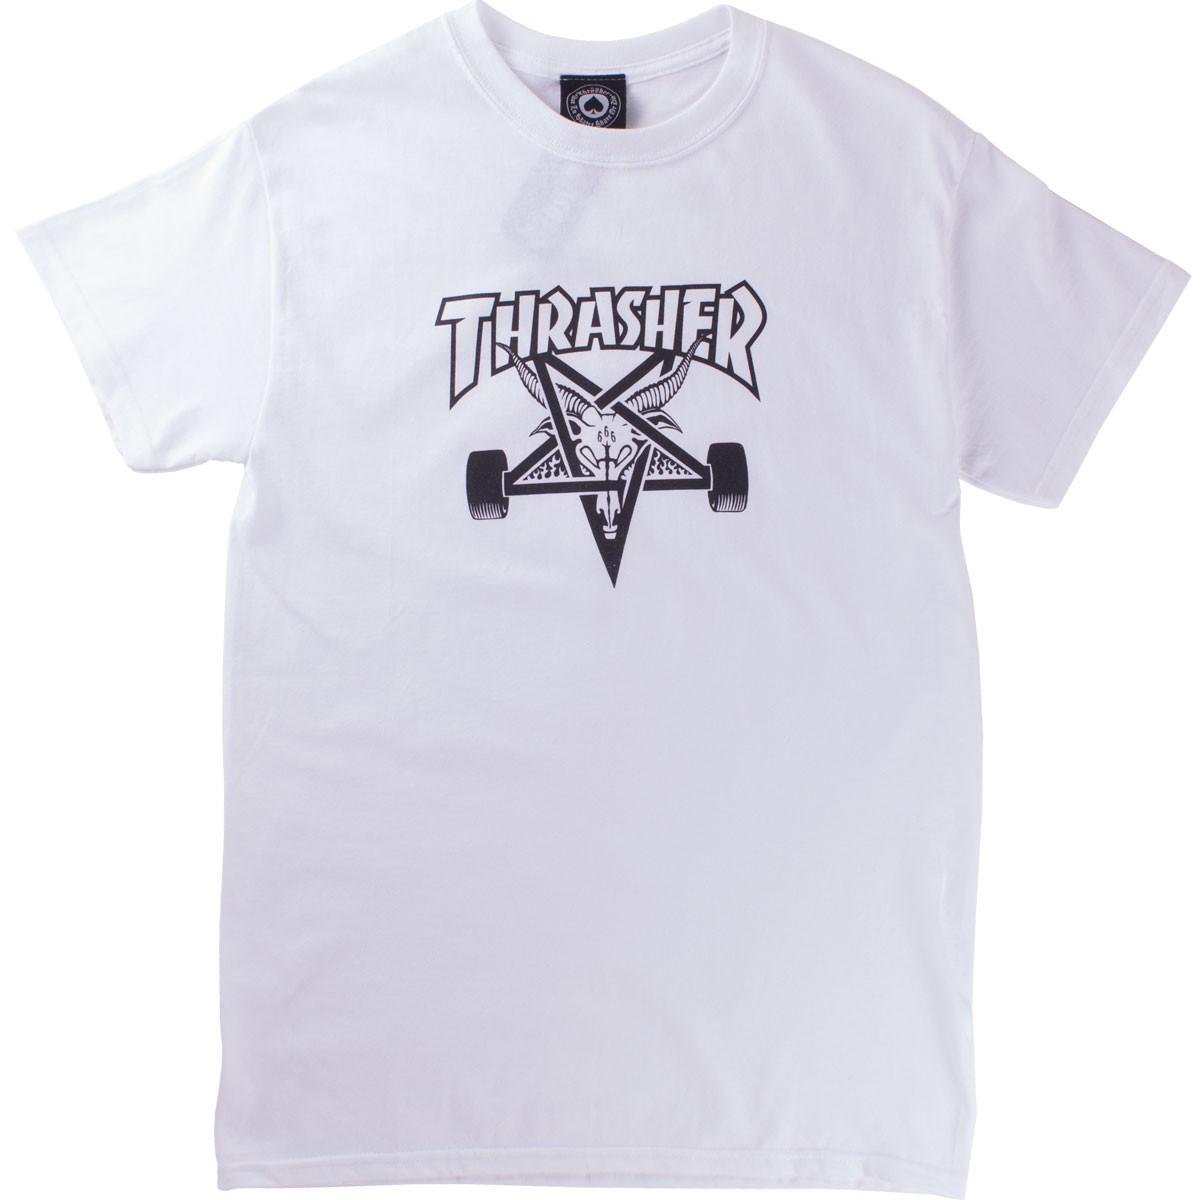 45a2125e62de Details about Thrasher Skategoat SS Tshirt White Black